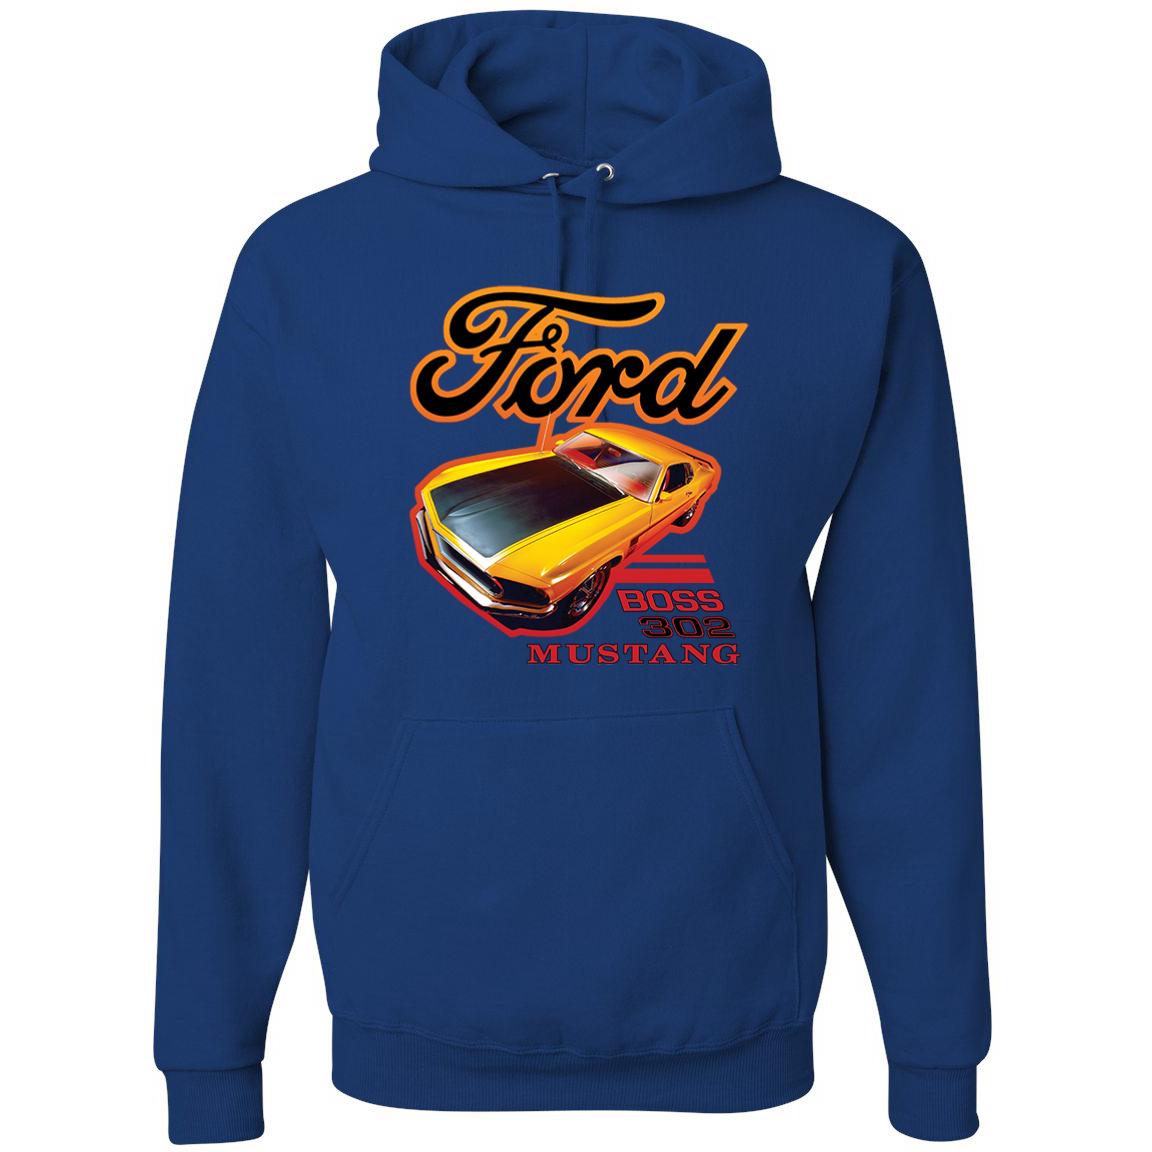 Ford Boss 302 Mustang Racing Classic Cars and Trucks Graphic Hoodie Sweatshirt, …